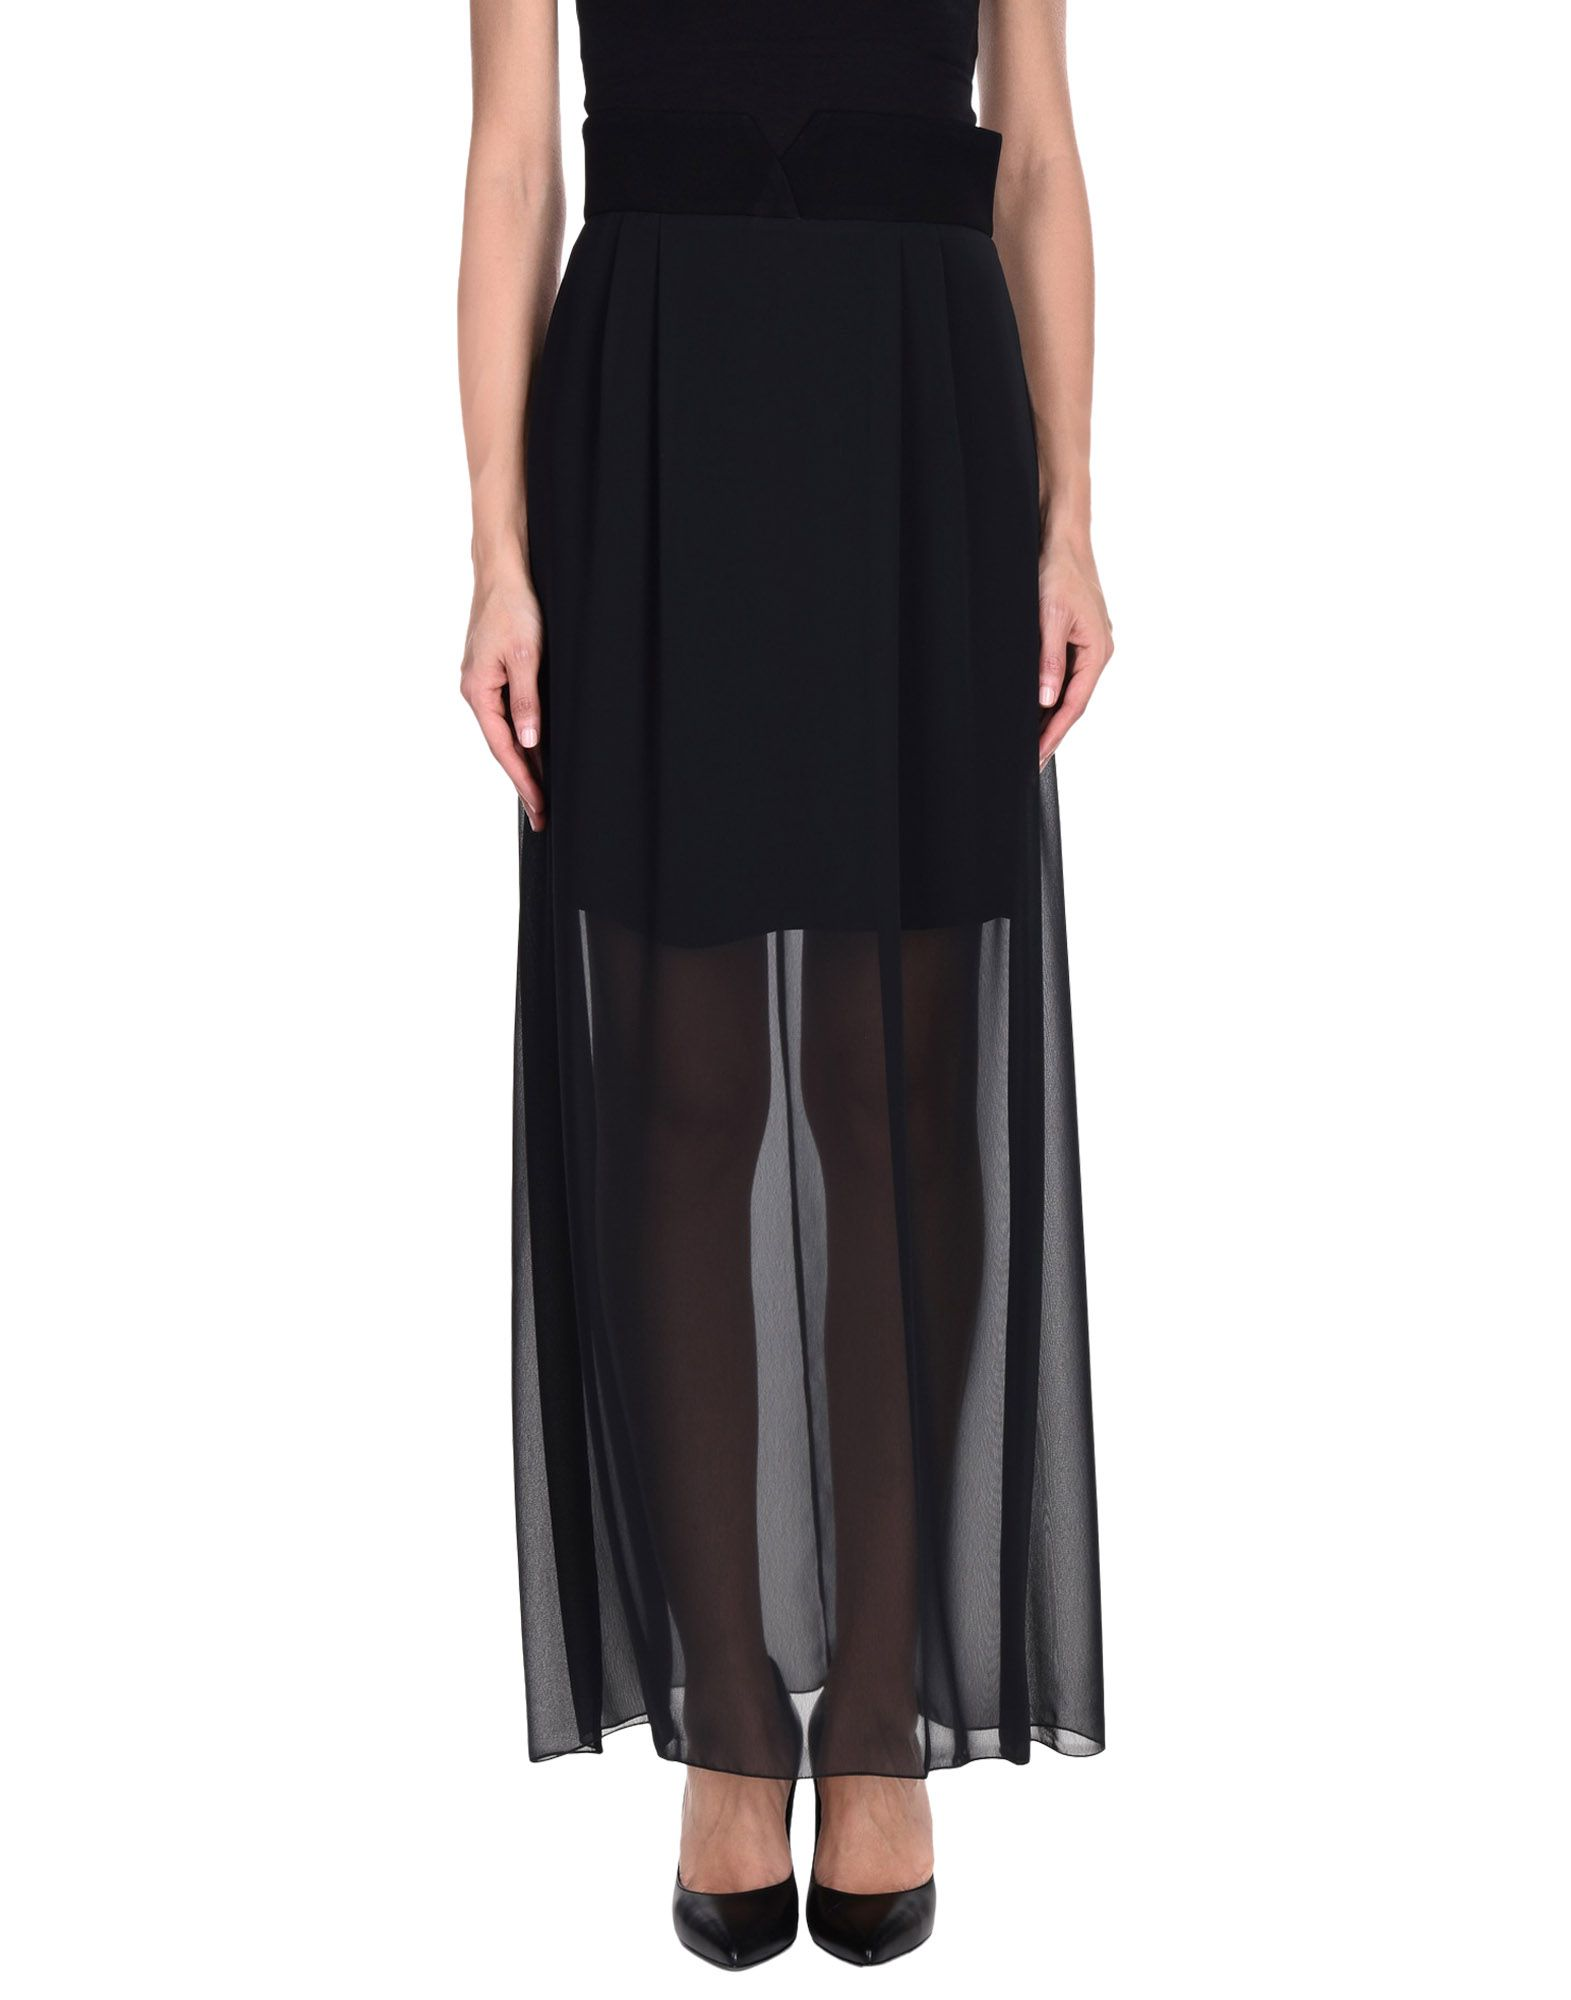 ALEX VIDAL Длинная юбка юбка freespirit freespirit mp002xw1iel2